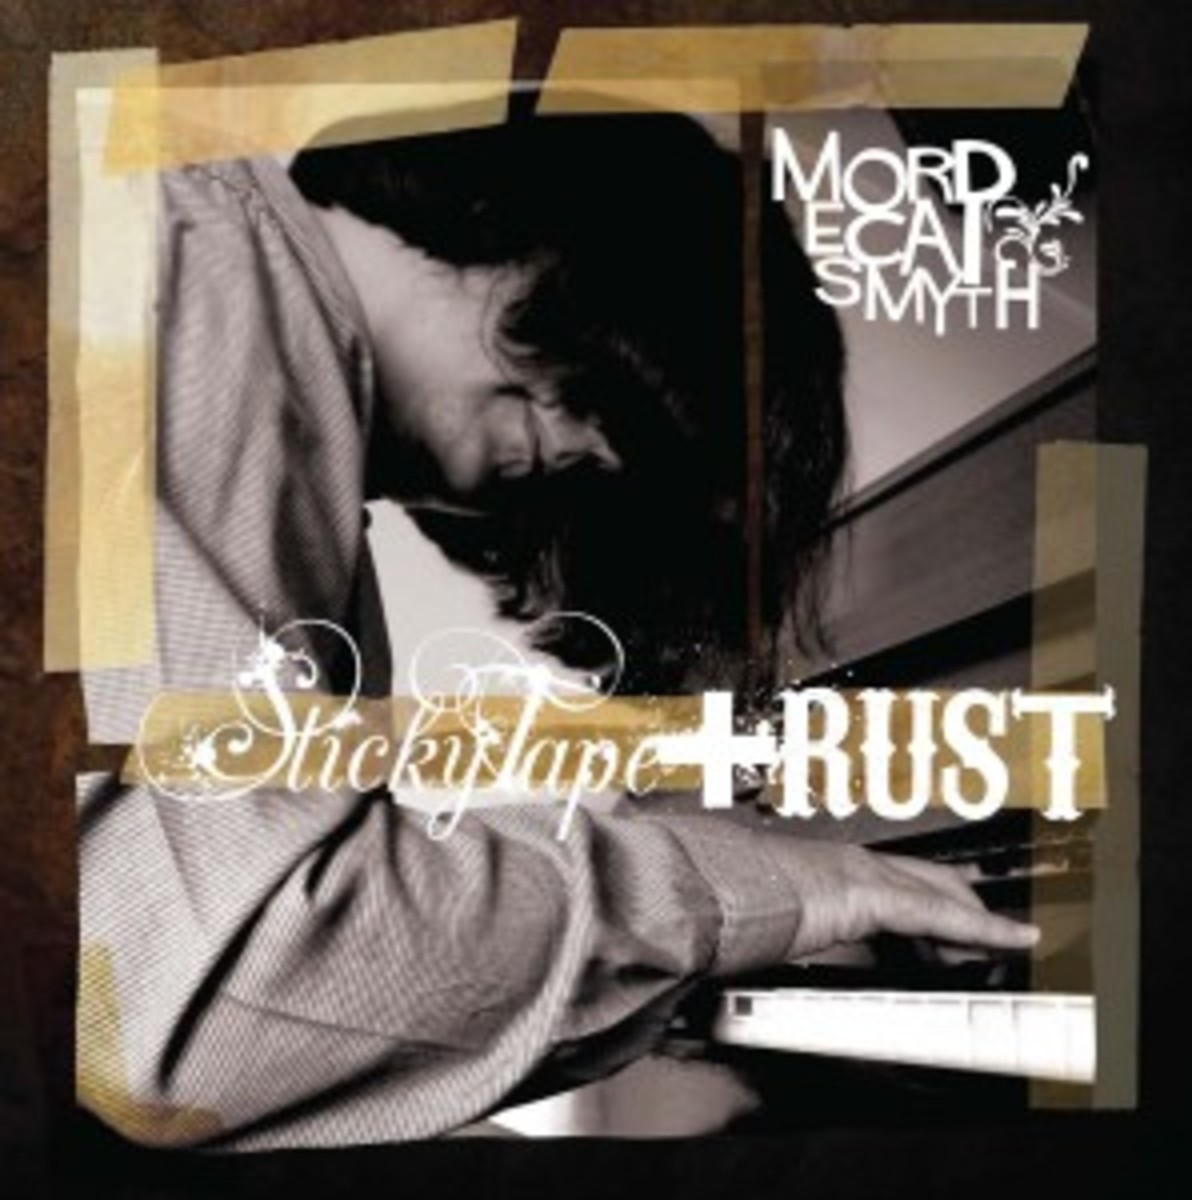 Mordecai Smyth - without whom...